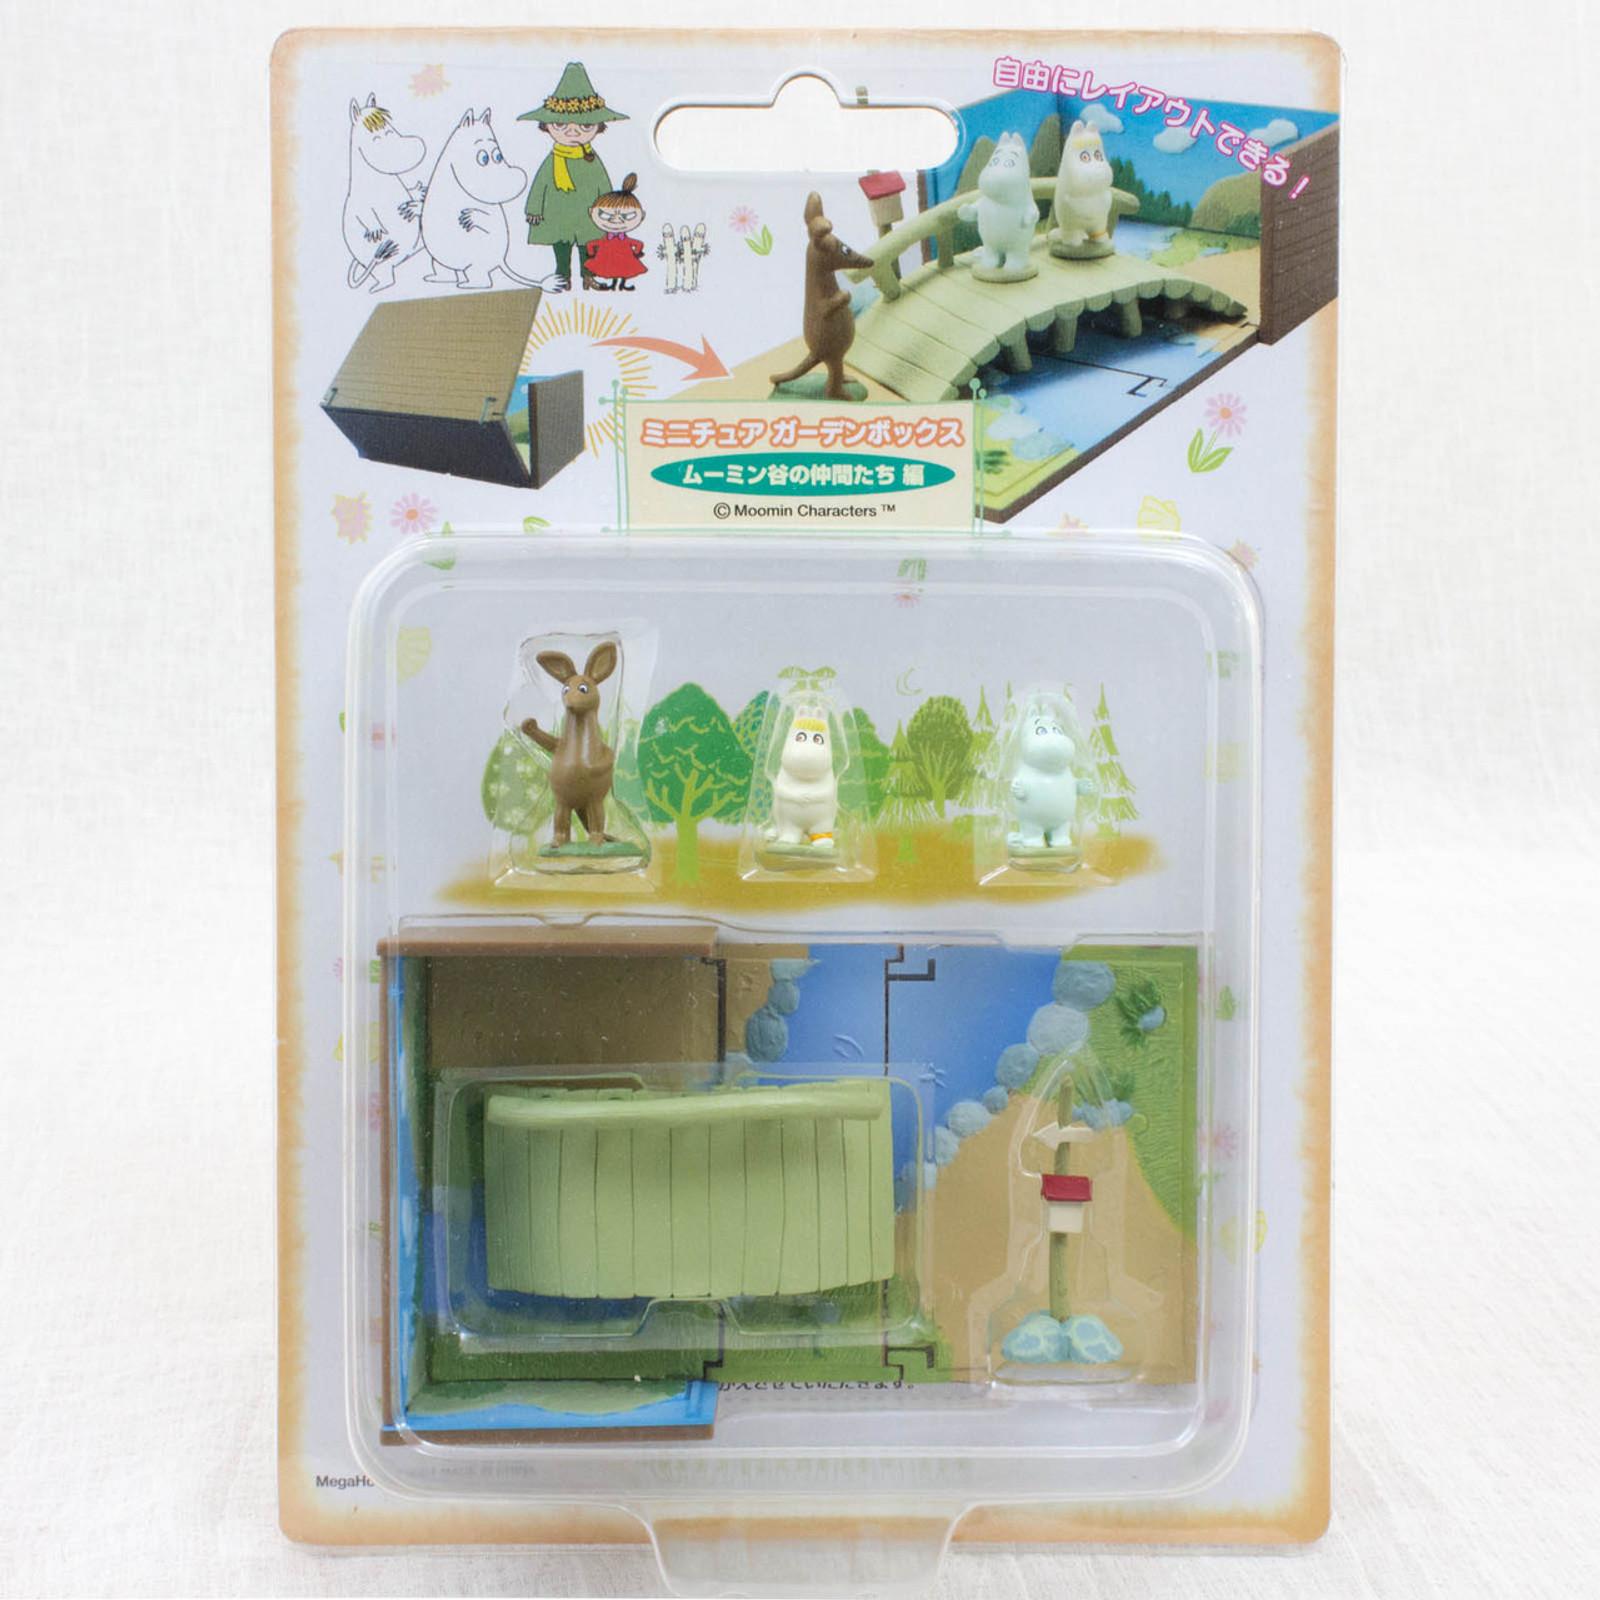 RARE! Moomin Characters Miniature Garden Snork Maiden & Sniff Megahouse JAPAN